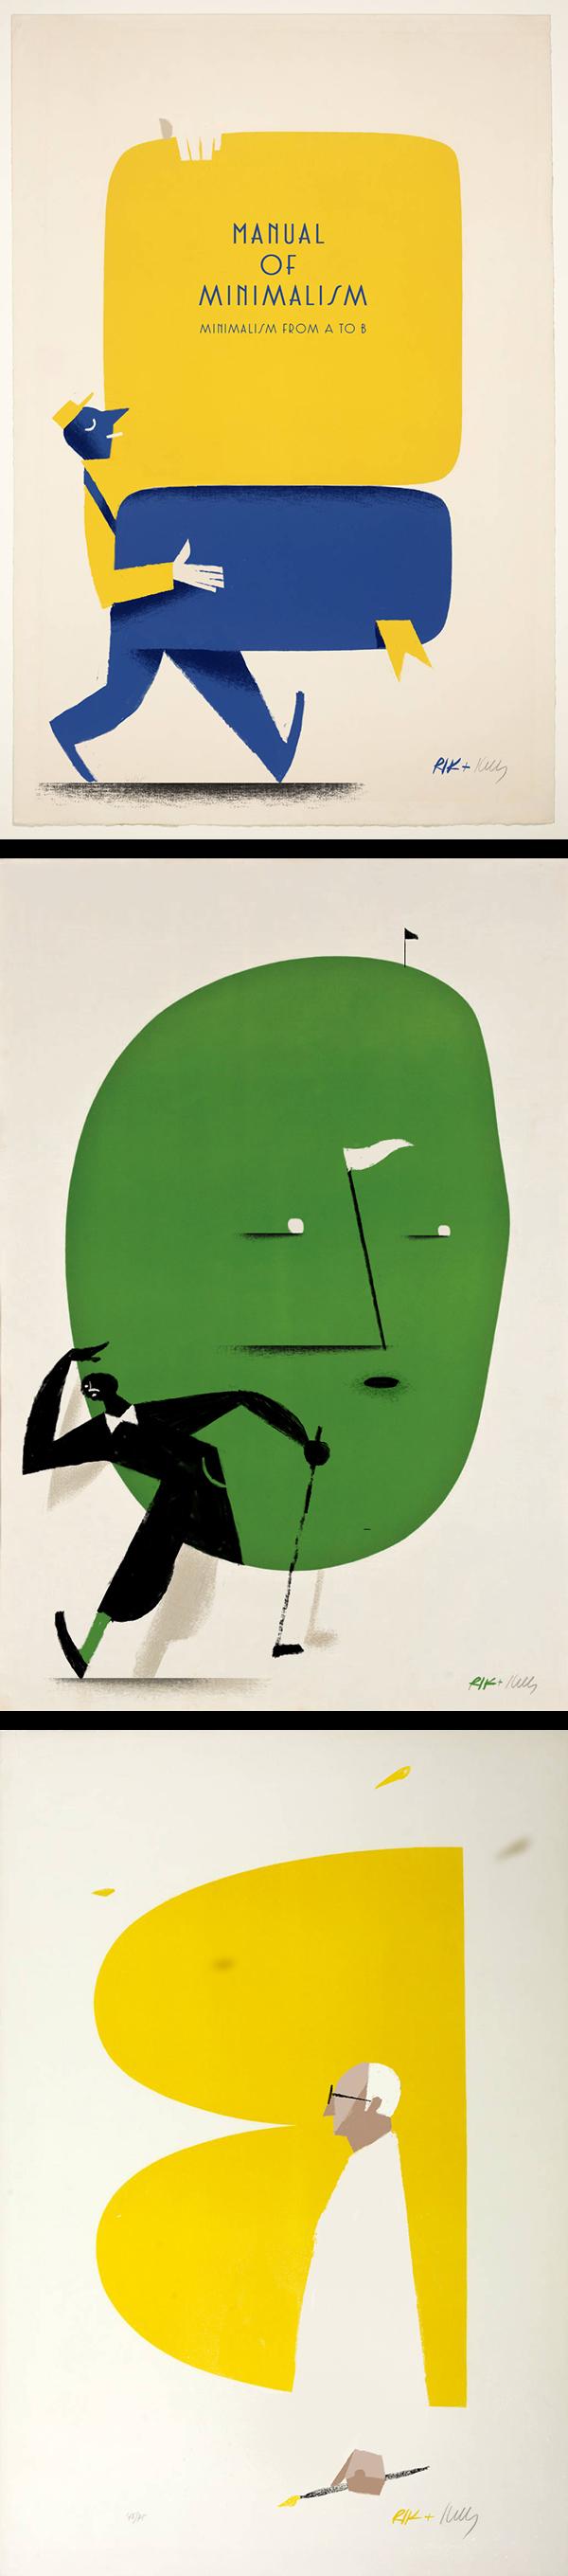 Inspirations graphiques #15 Riccardo Guasco | Minimalisms